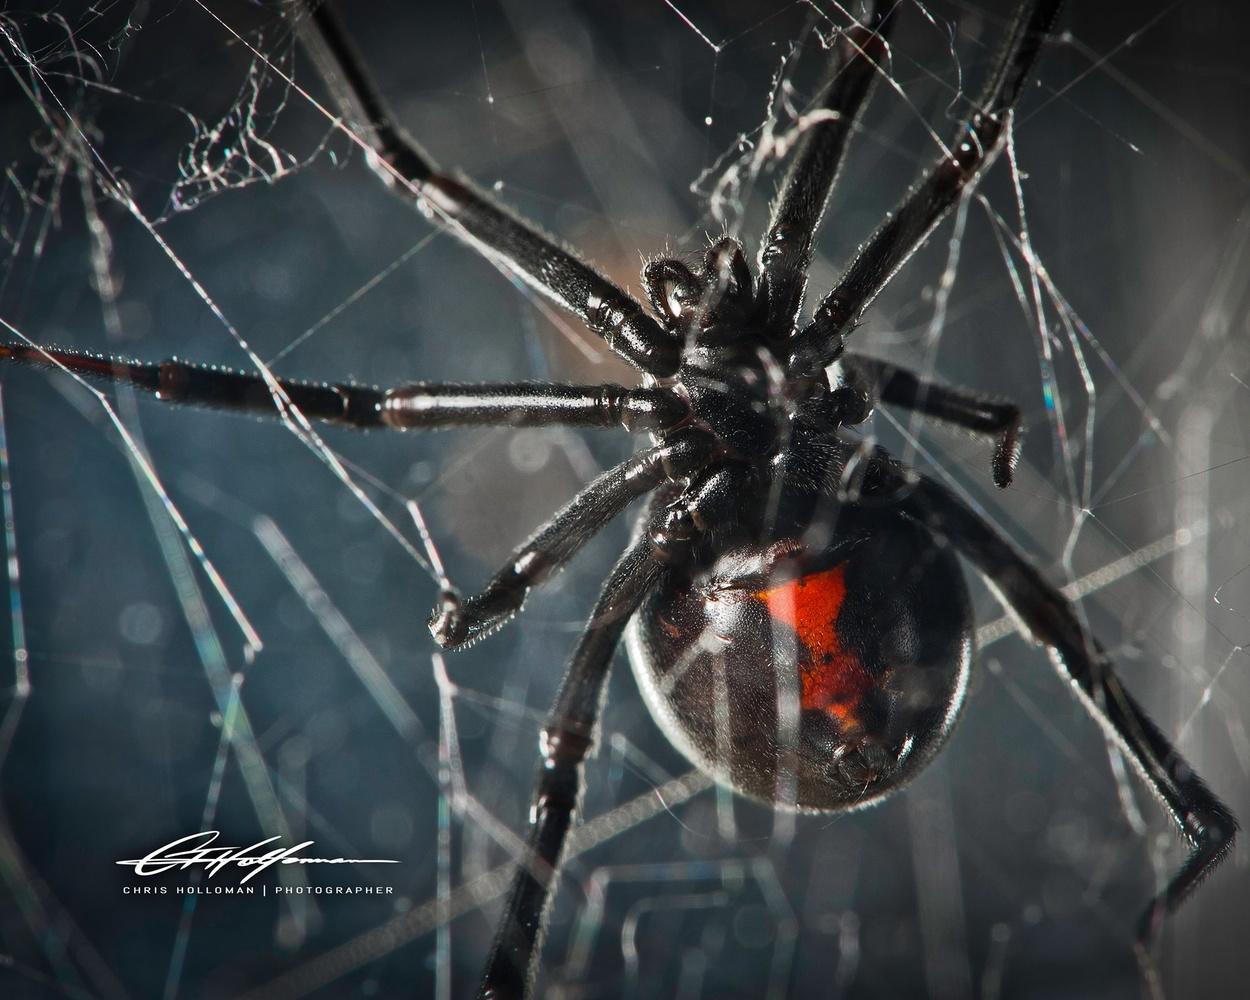 Black Widow by Chris Holloman